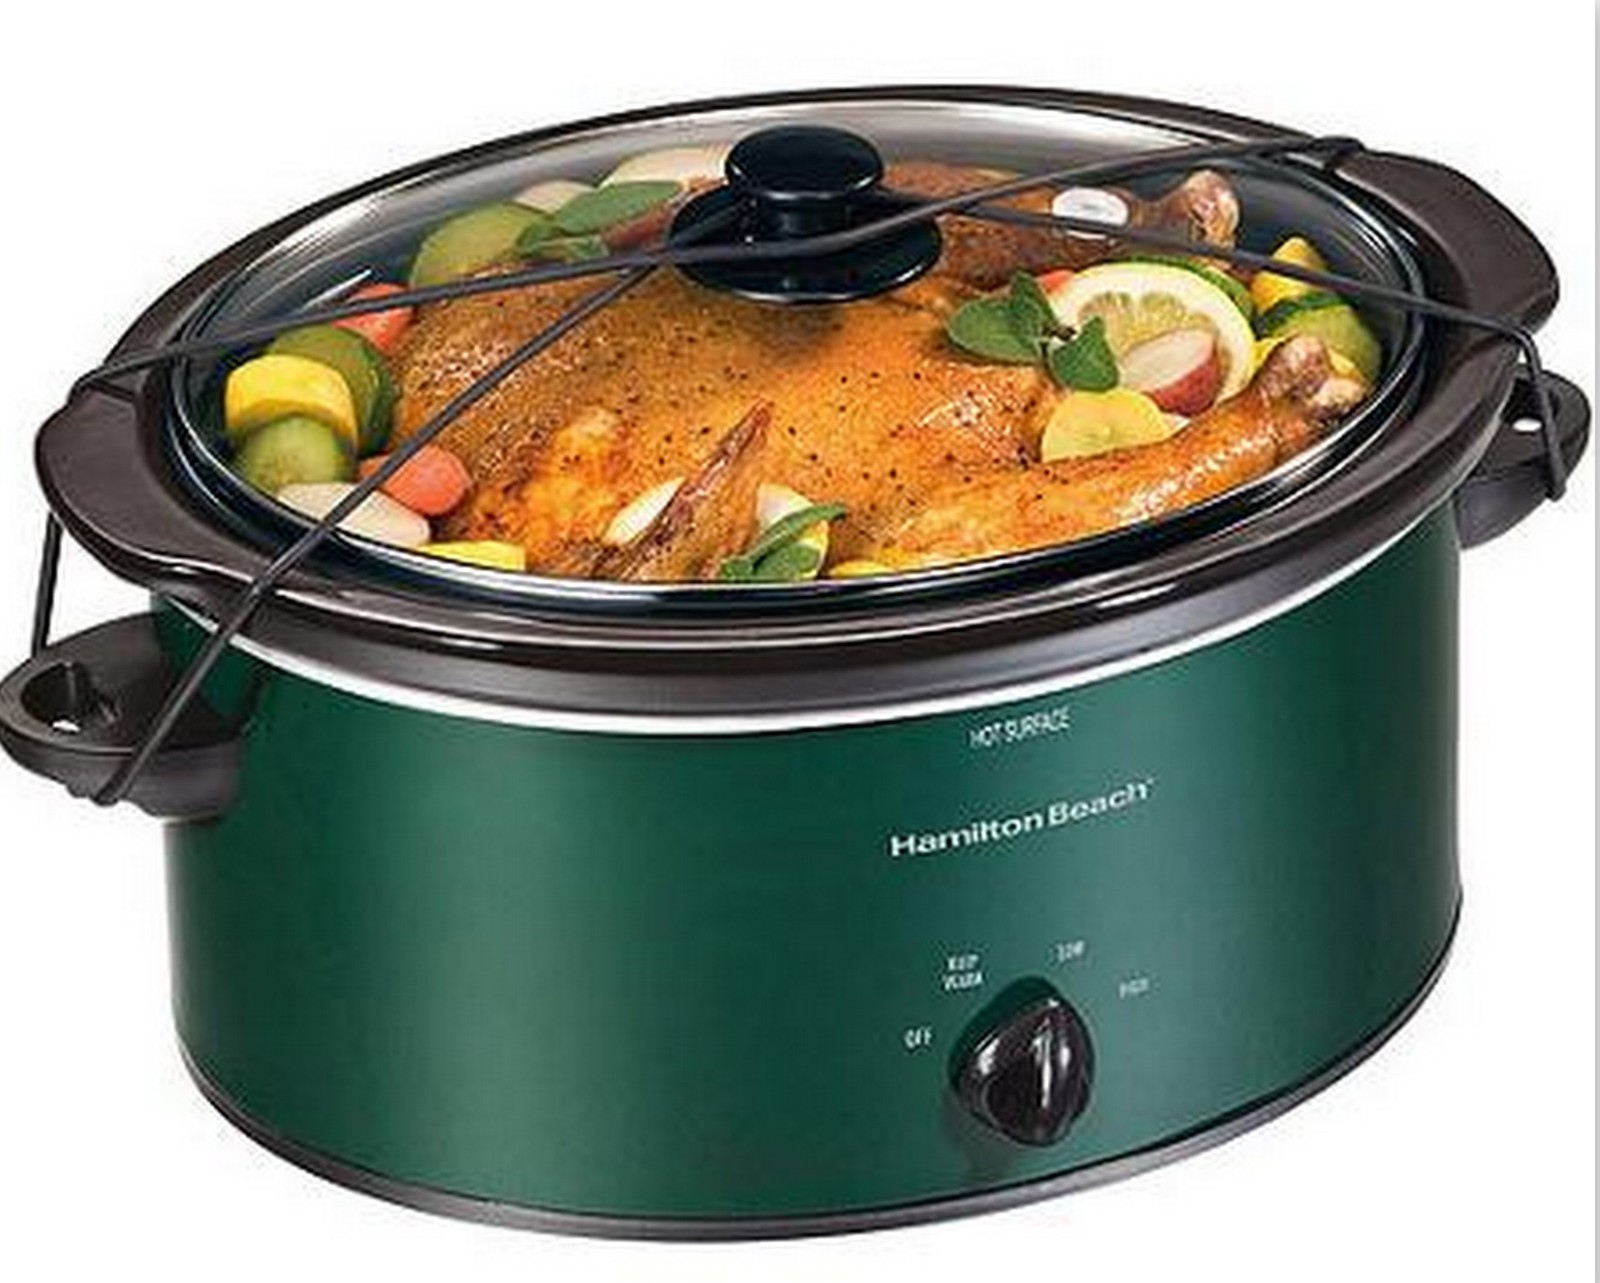 Hamilton beach green 5 quart slow cooker crock pot with for Hamilton beach pioneer woman slow cooker